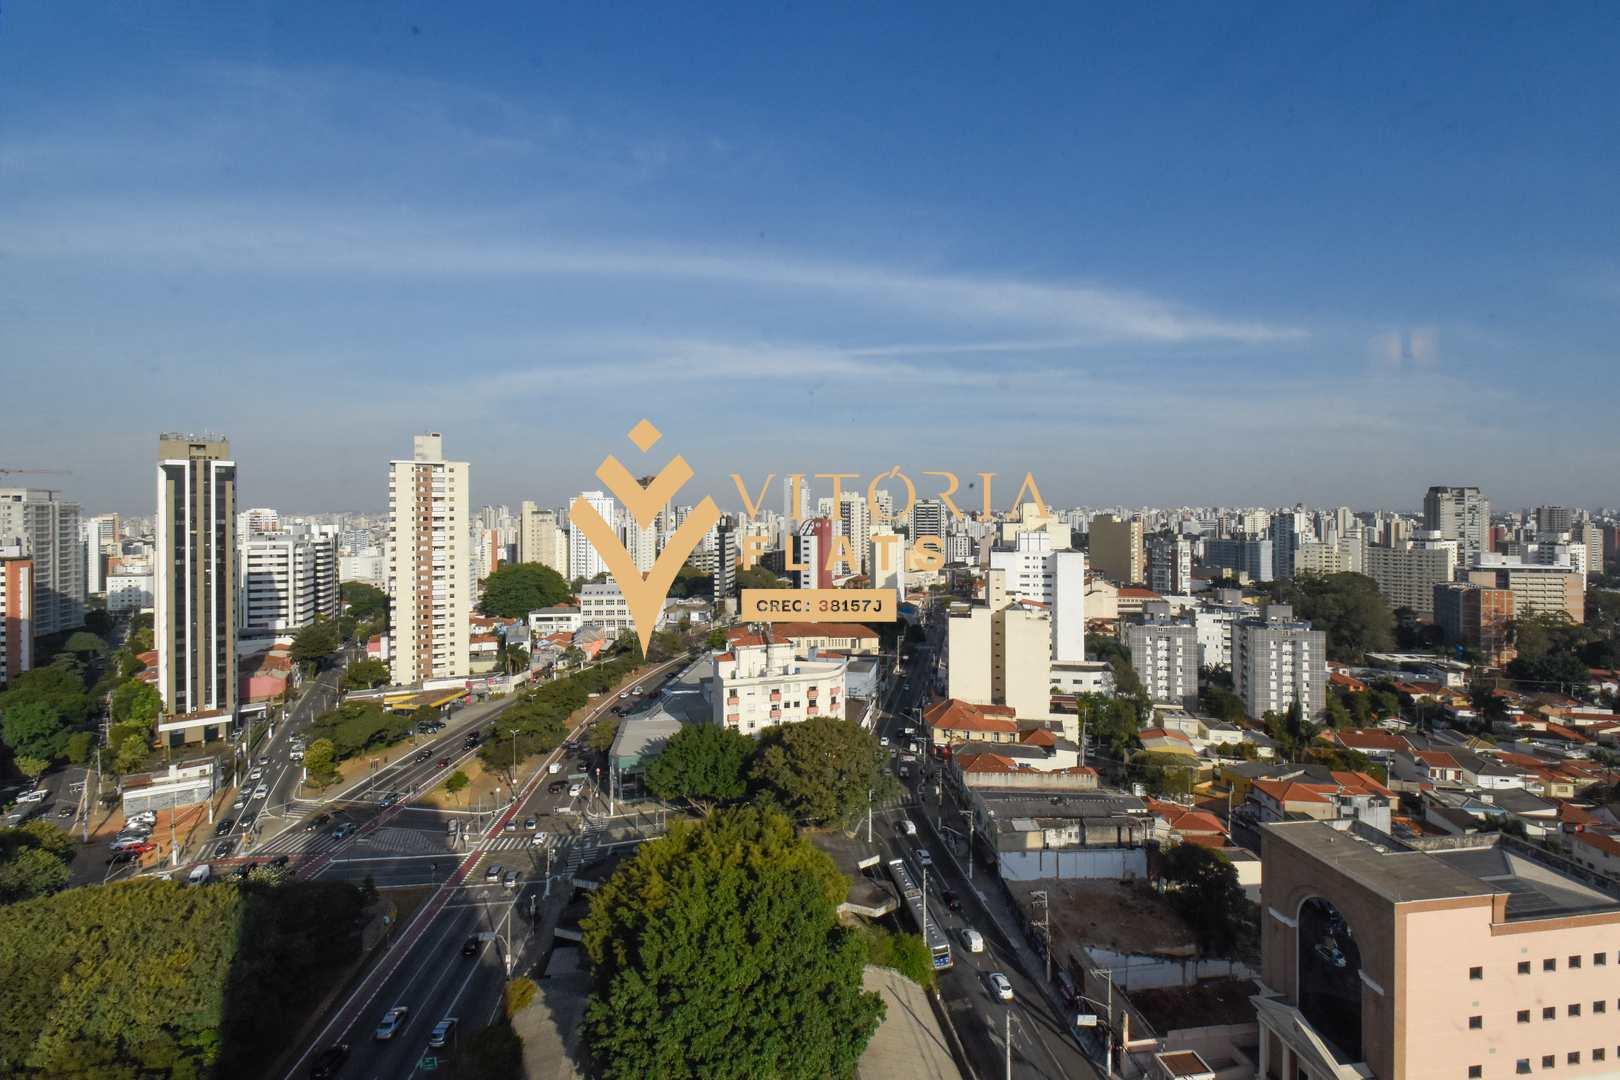 Flat com 1 dorm, Vila Mariana, São Paulo - R$ 445 mil, Cod: 64460124